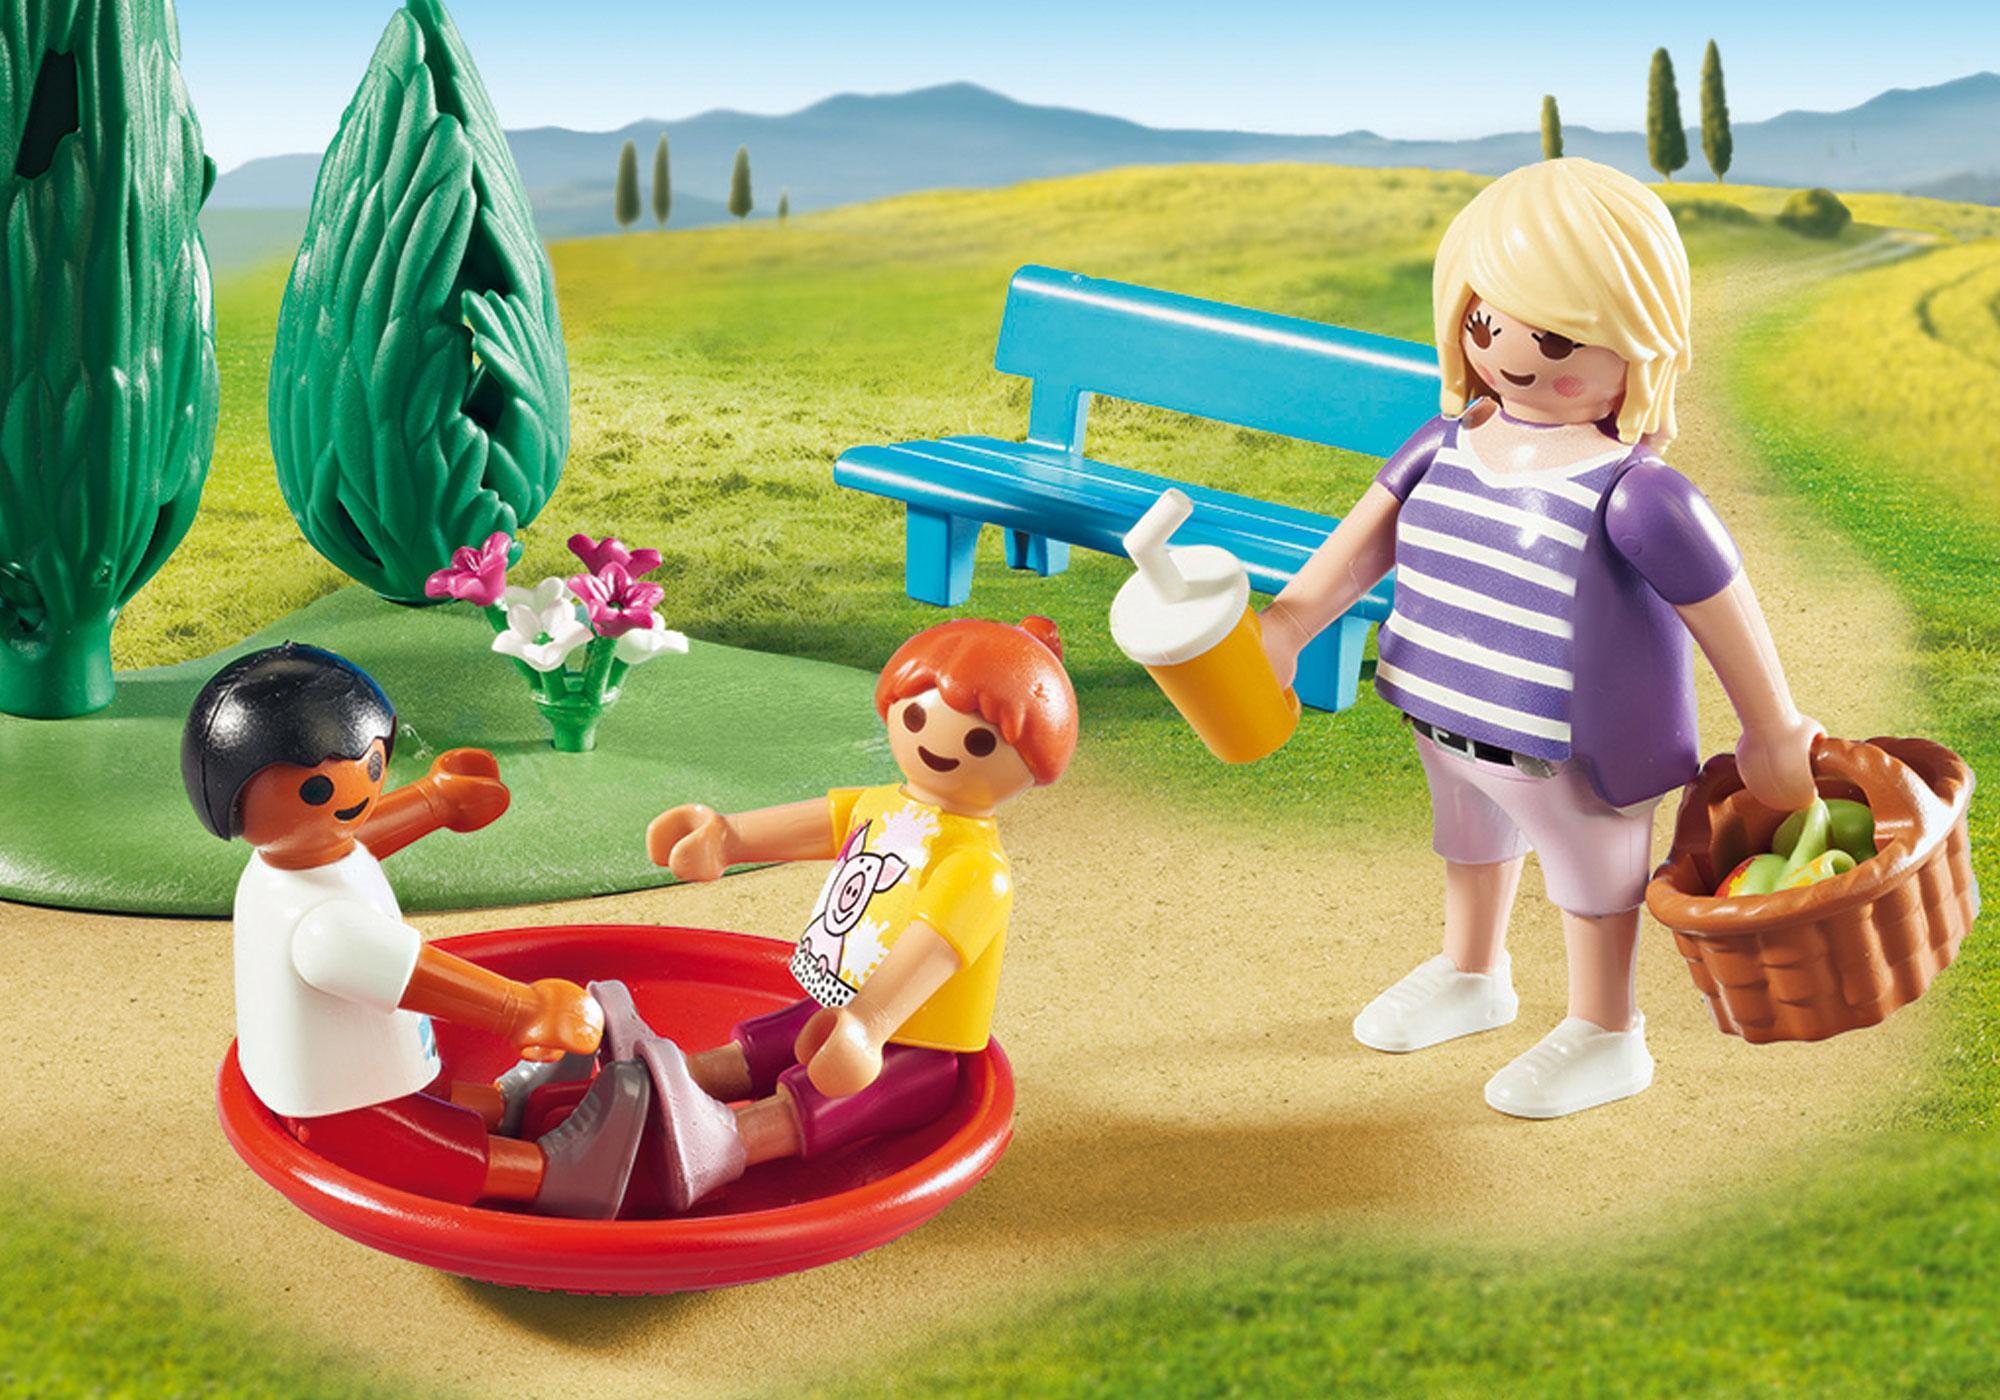 http://media.playmobil.com/i/playmobil/9423_product_extra2/Parc de jeu avec toboggan